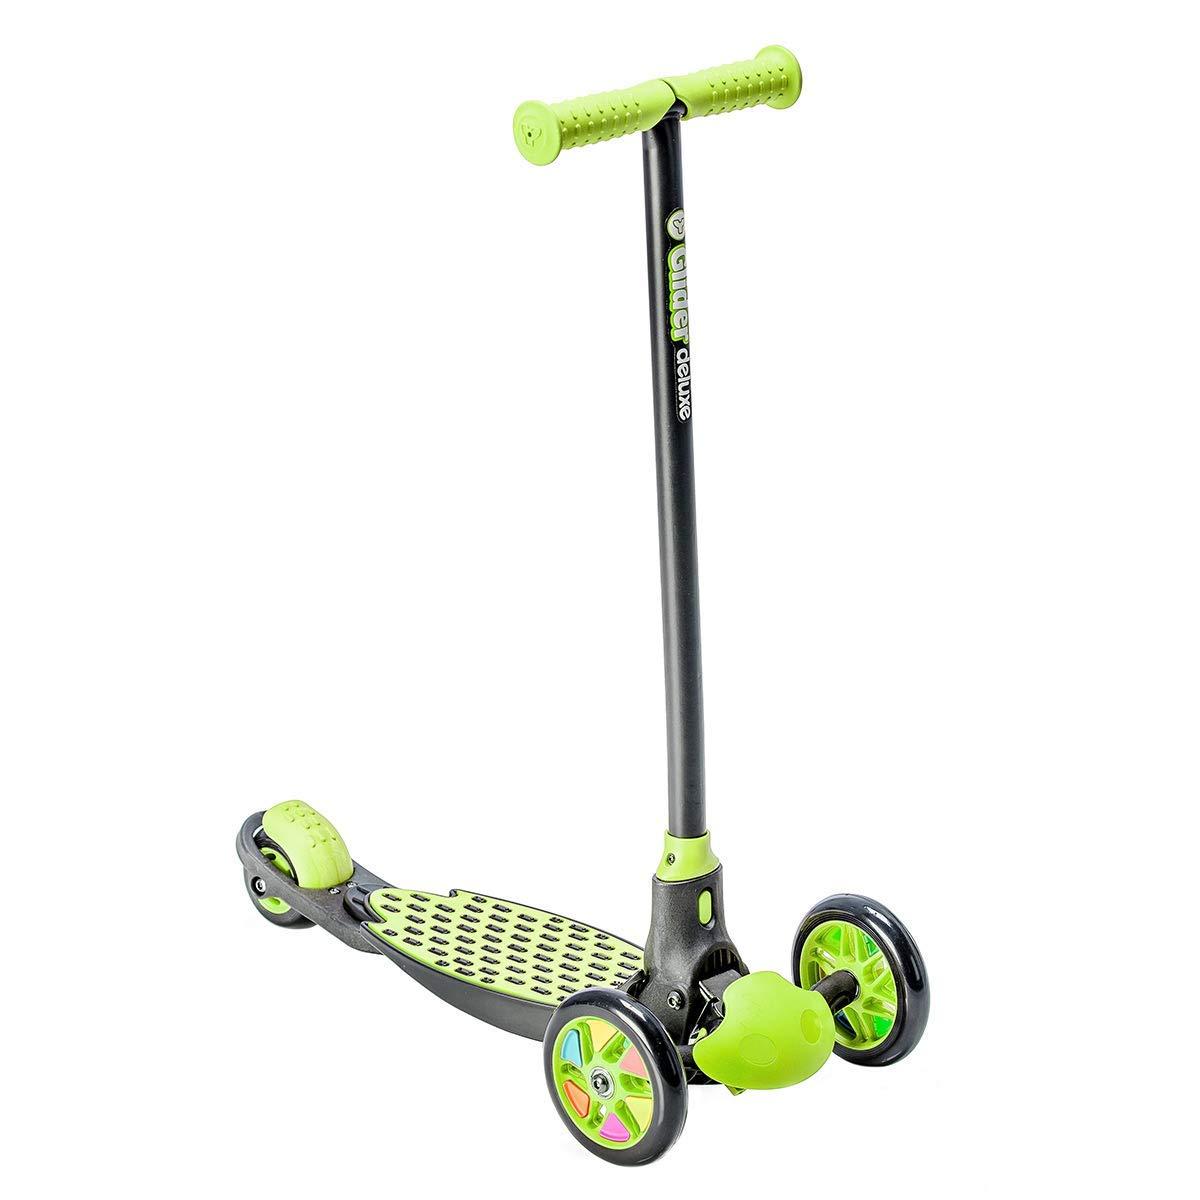 Y Volution Y Glider Deluxe Scooter Green